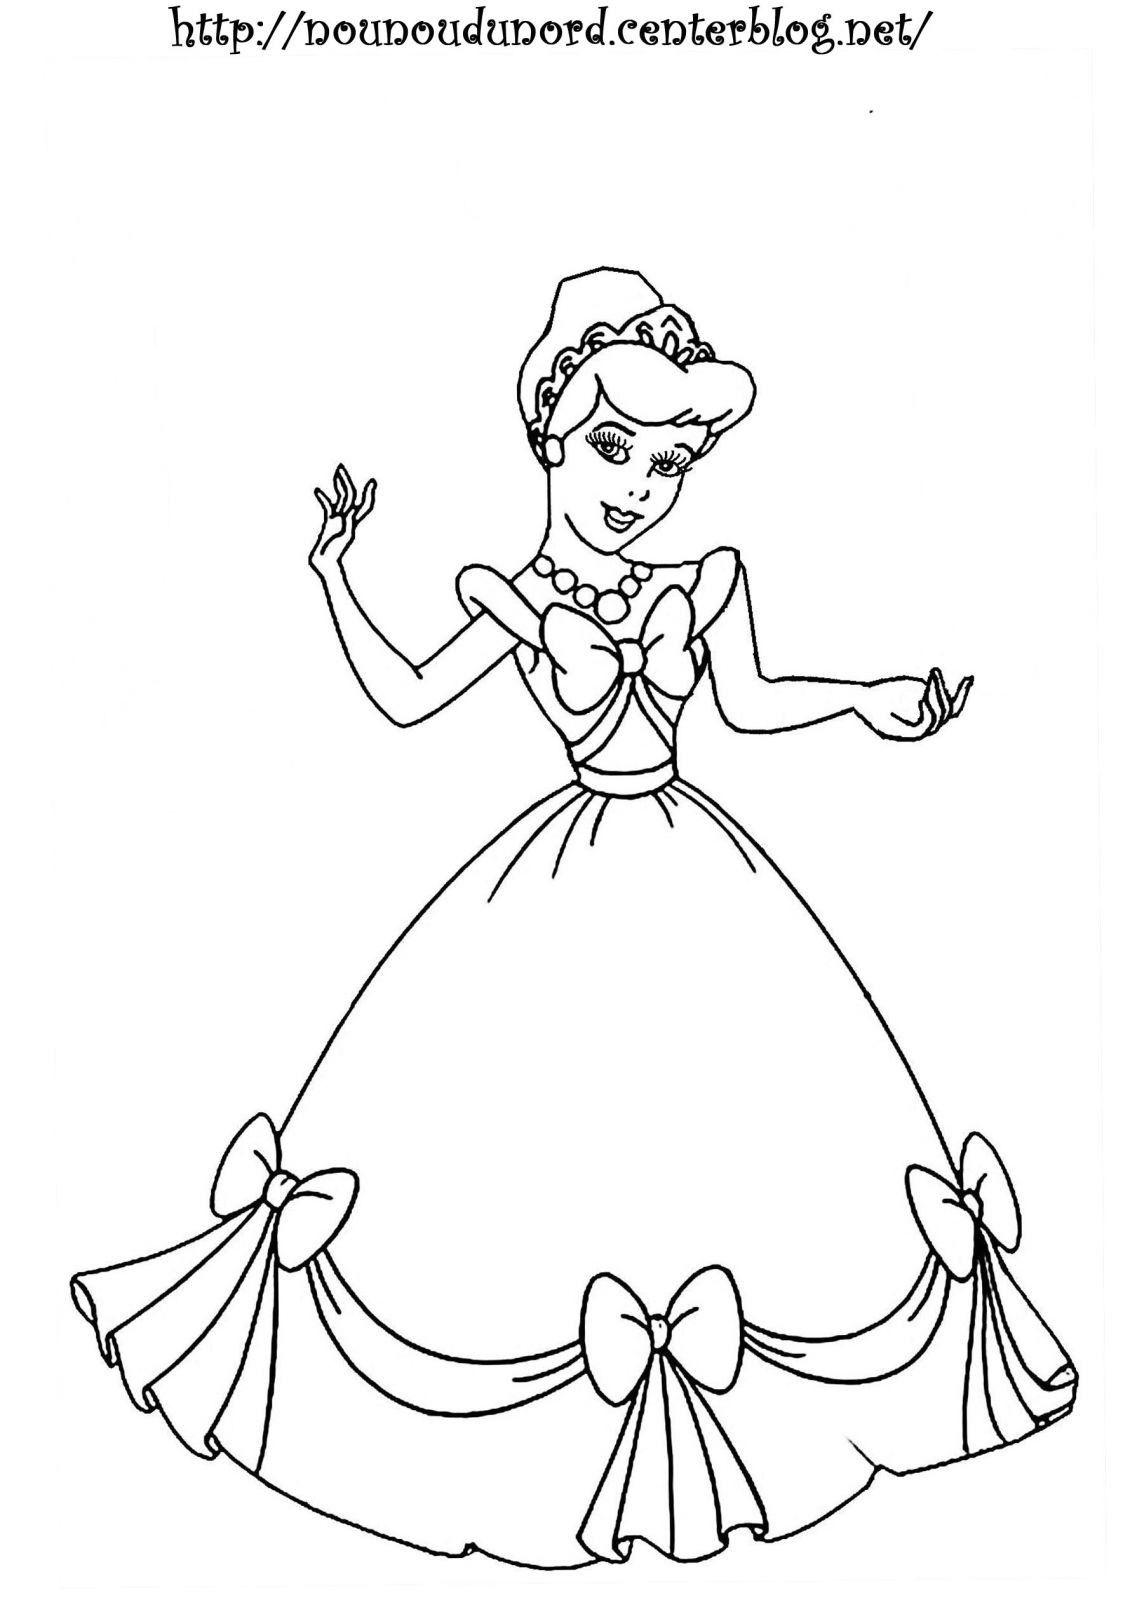 Coloriage De Princesse Disney Gratuit A Imprimer  Princess